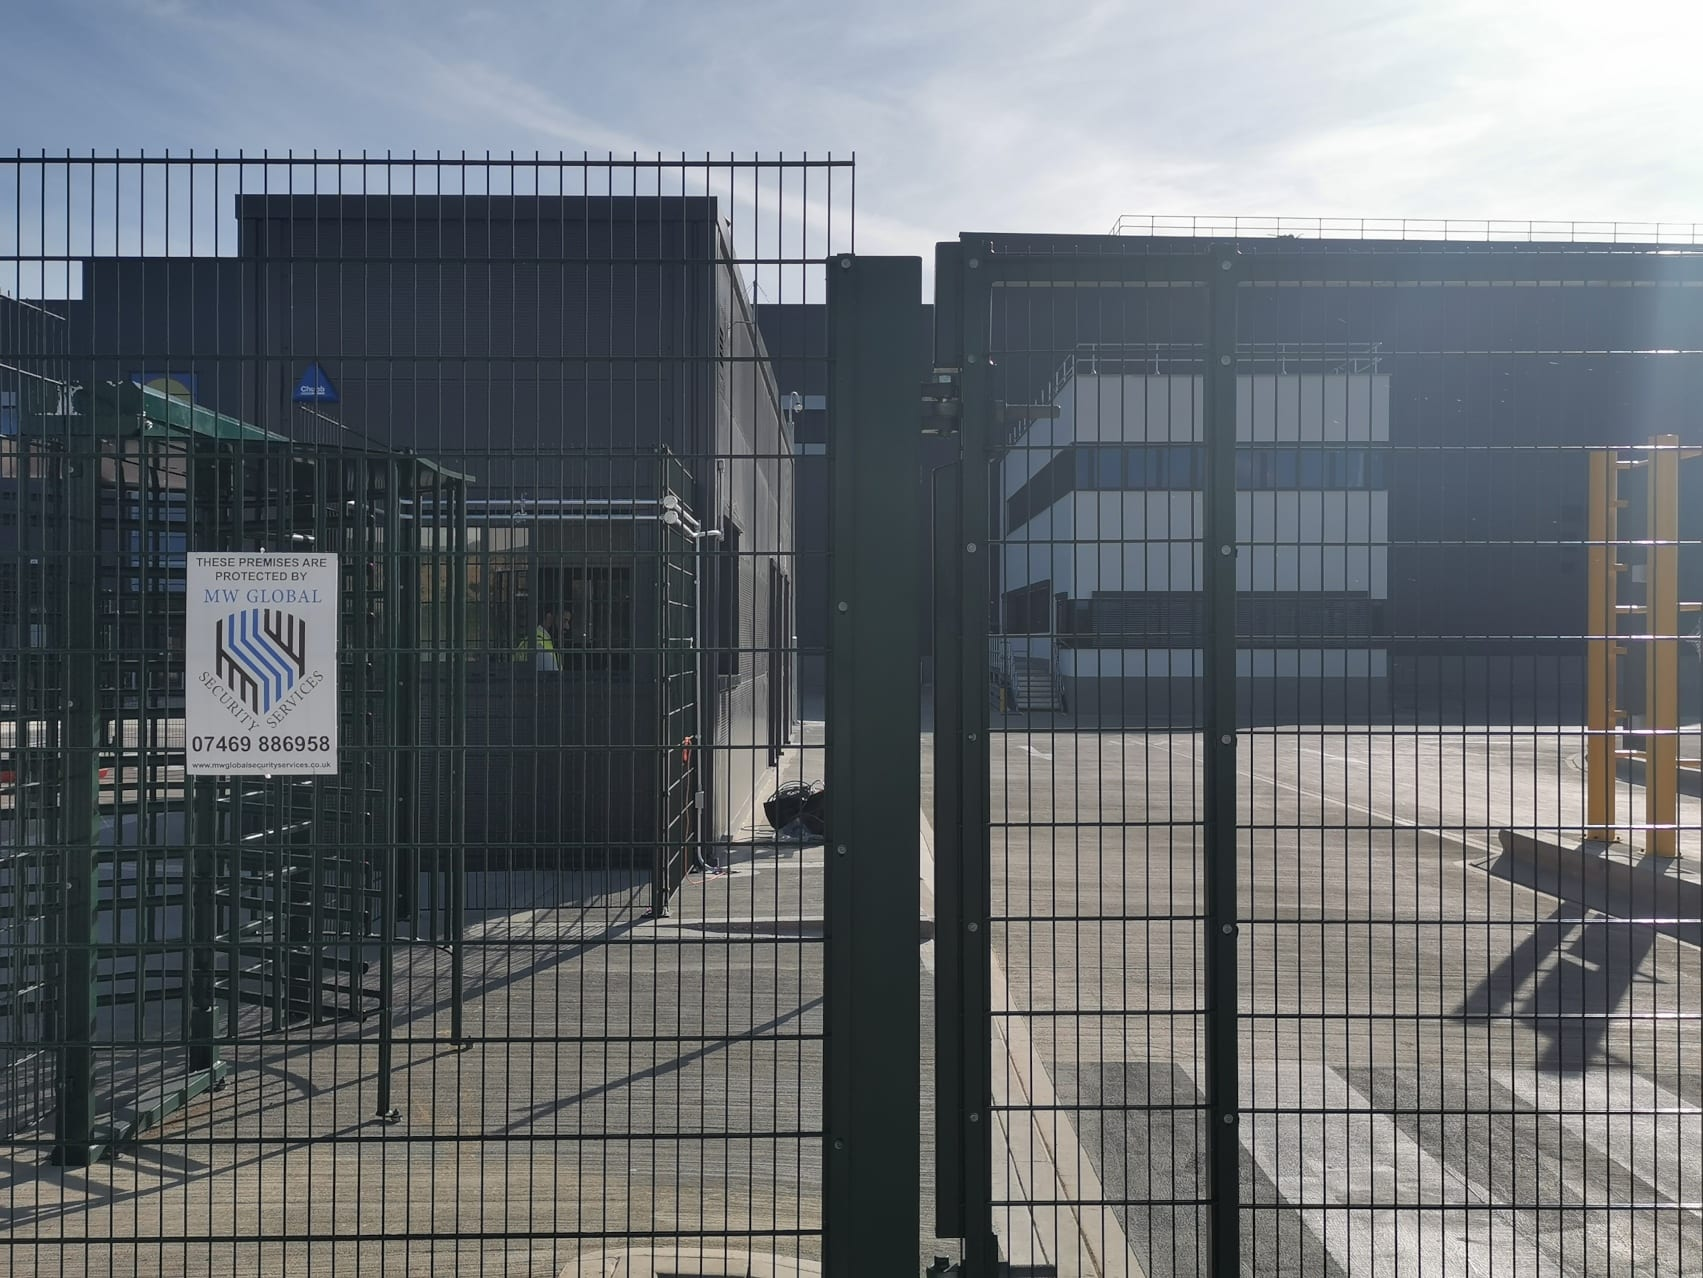 Gatehouse Security Guarding Services